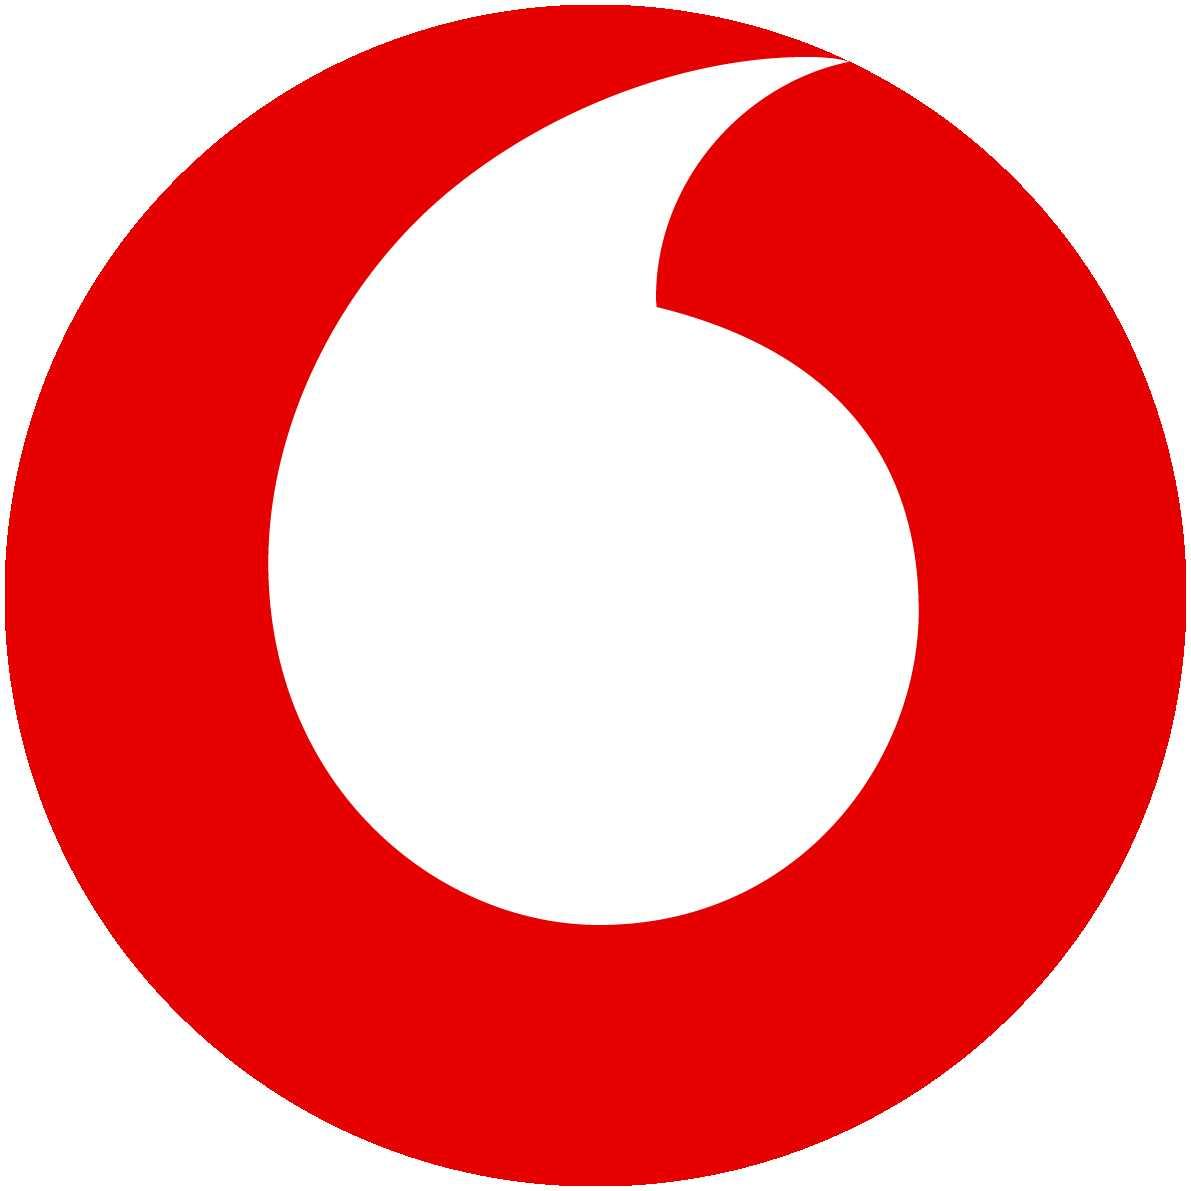 vodafone social pass gratis ueber die meinvodafon app